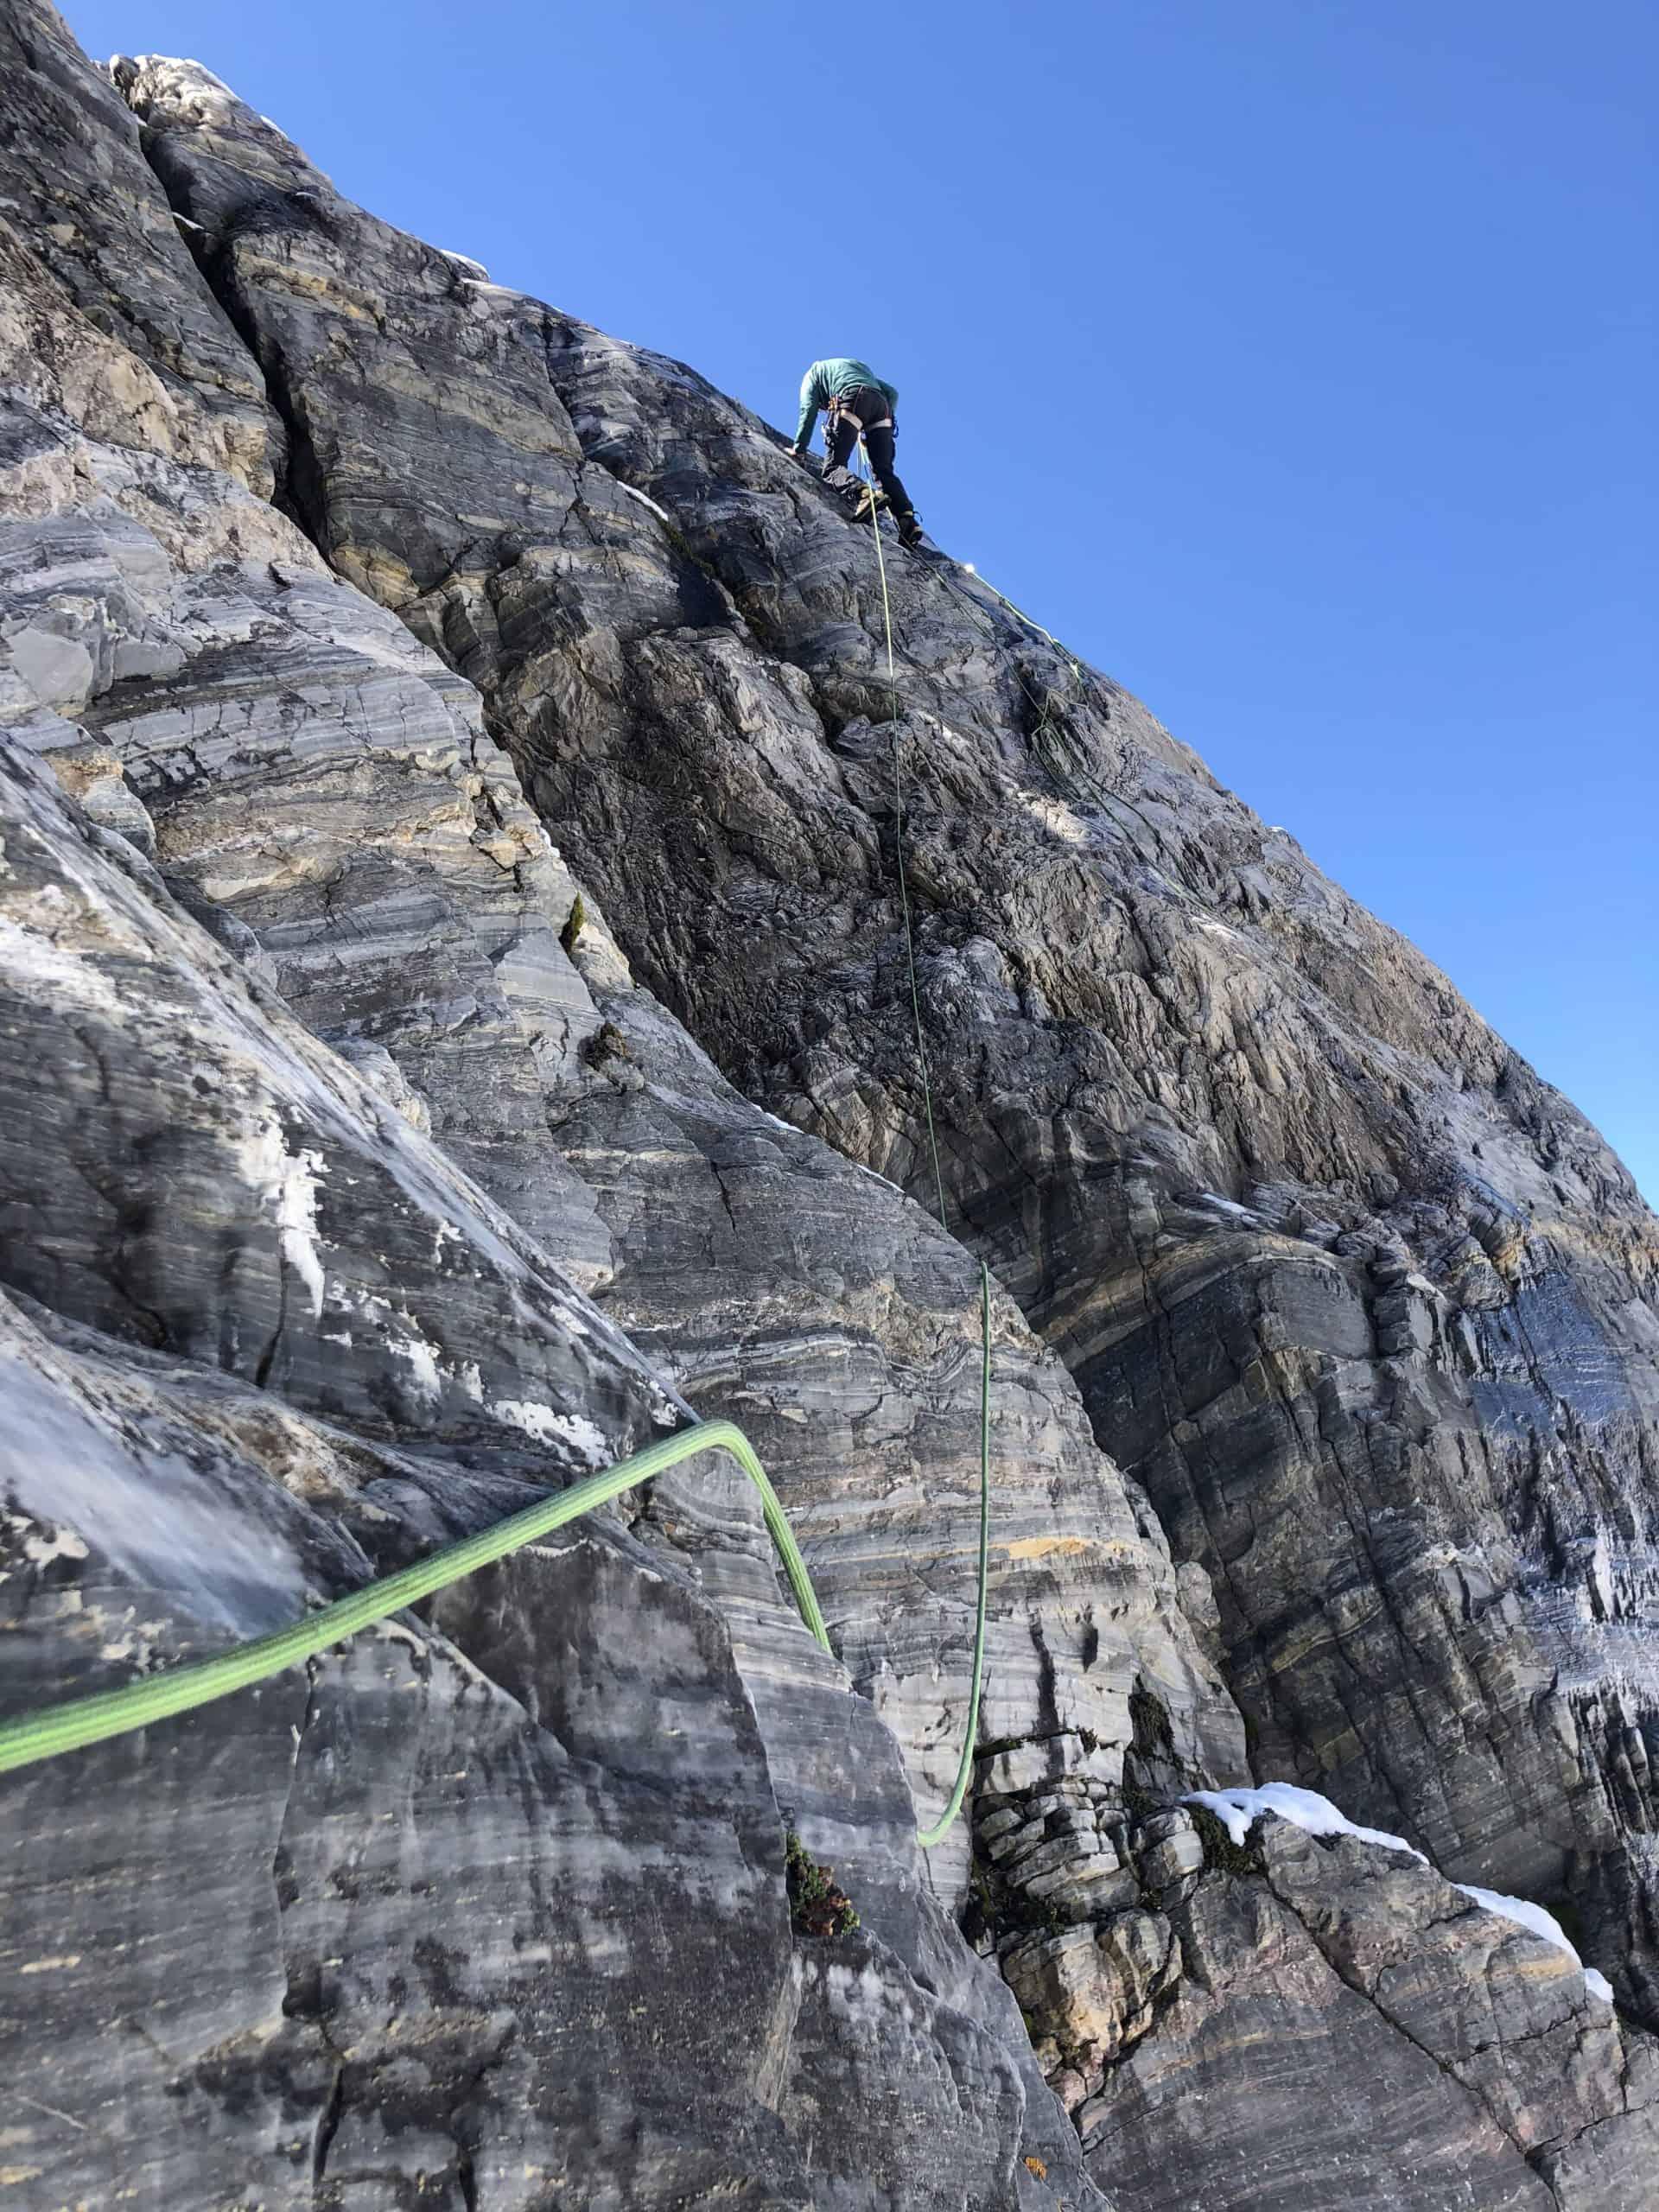 D643BBFA 7614 4E17 86C5 D6DEAAD3DC27 scaled - Turtmanntal - Klettern in den Alpen